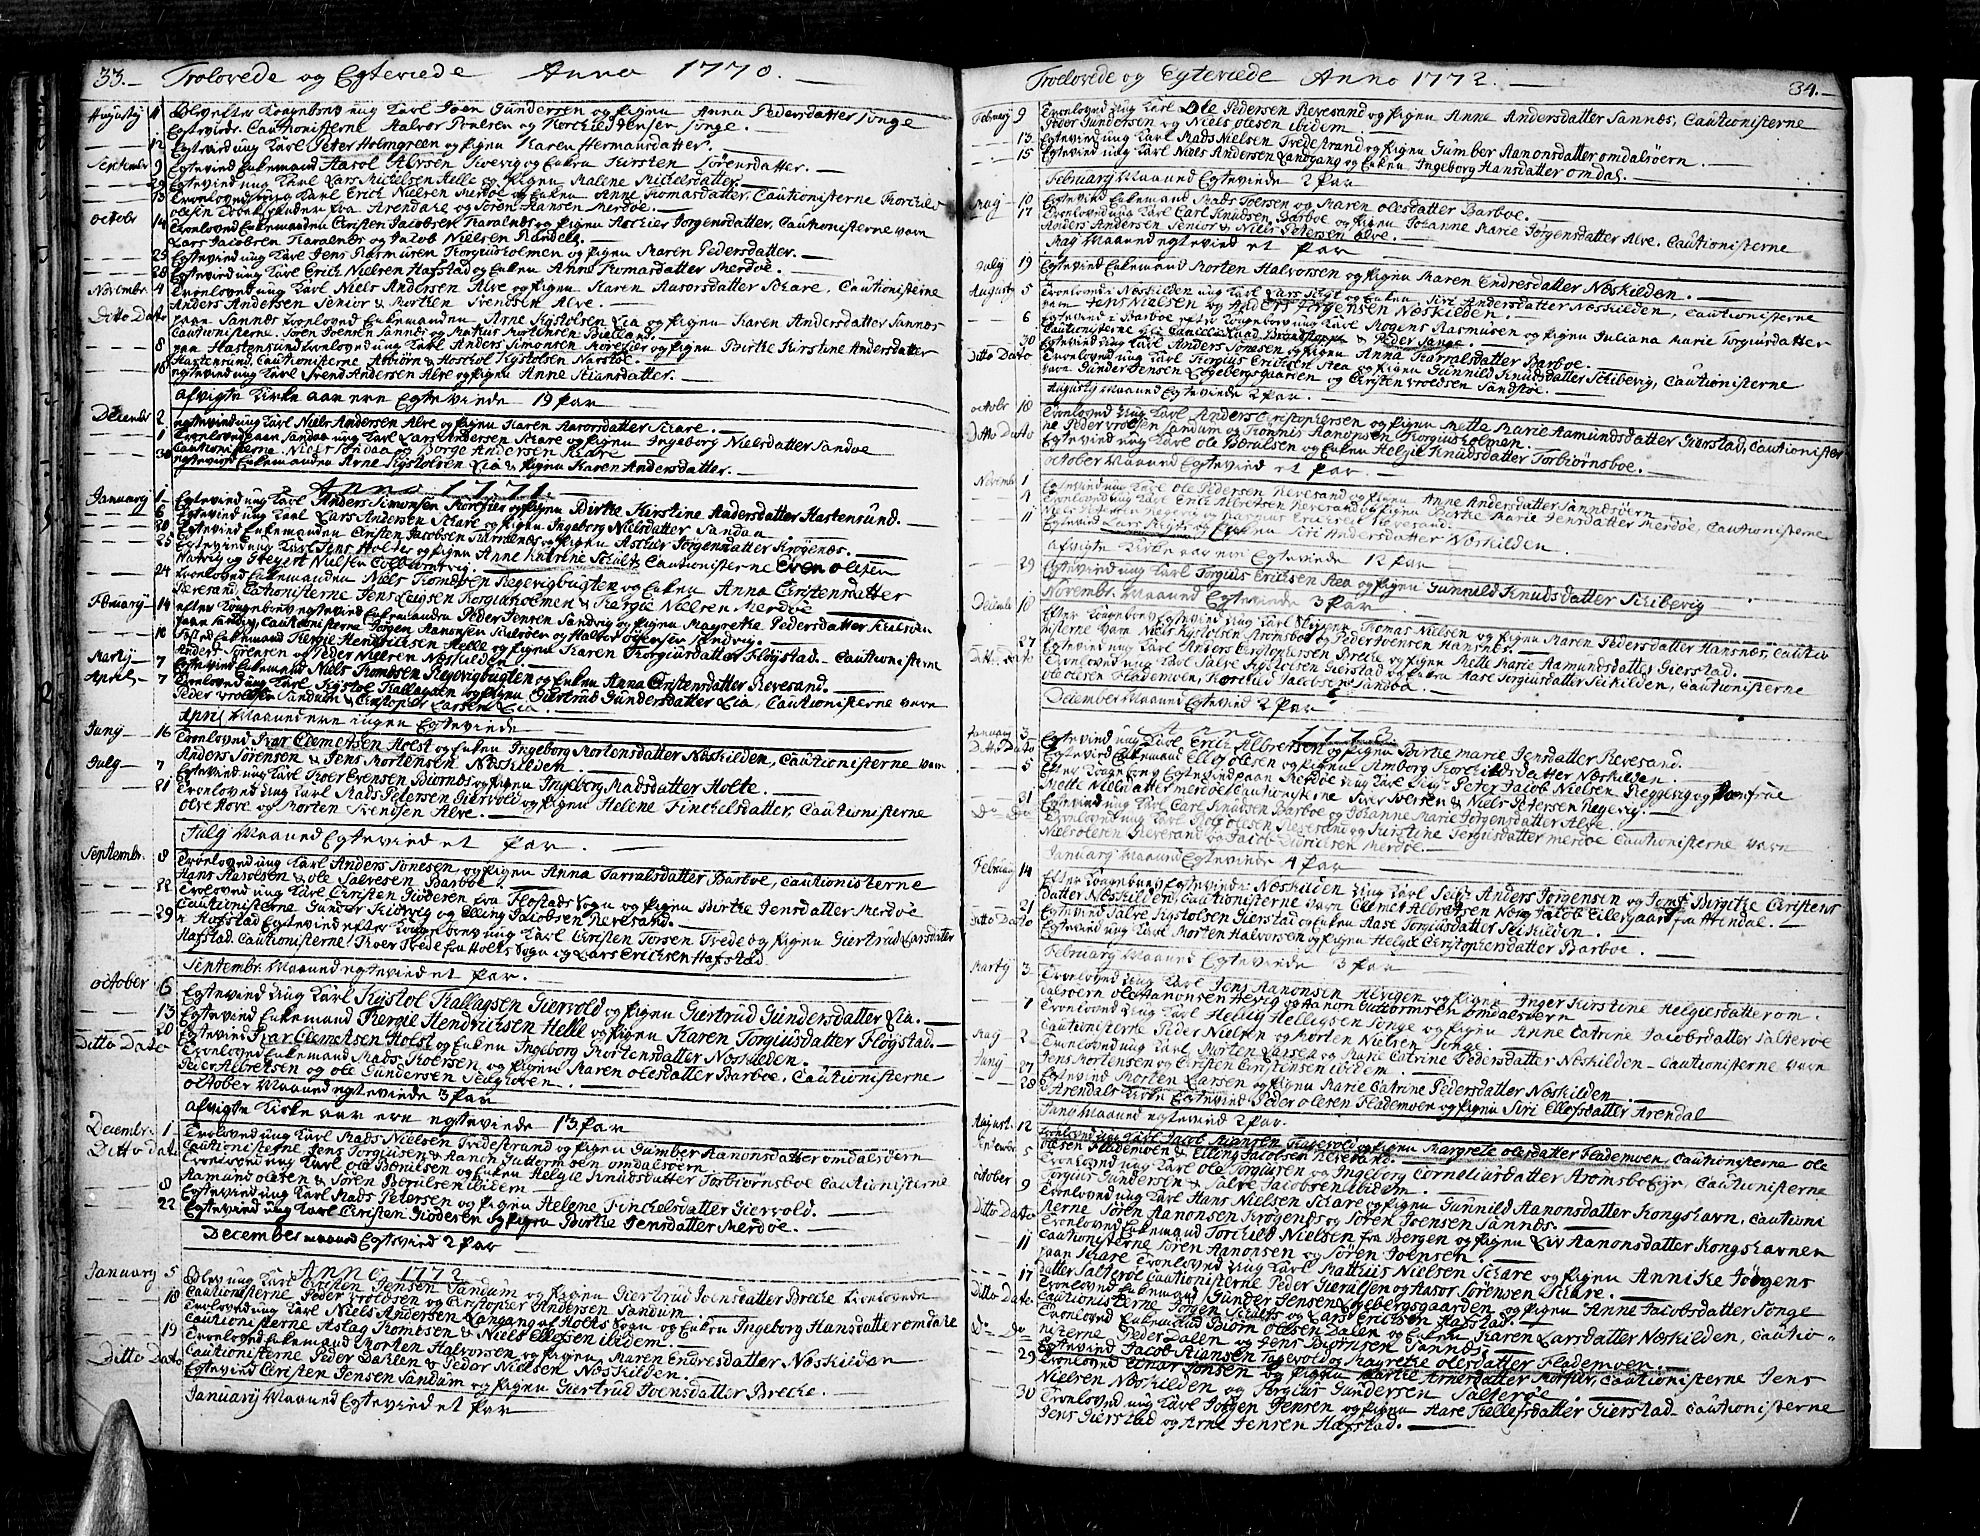 SAK, Tromøy sokneprestkontor, F/Fa/L0001: Ministerialbok nr. A 1, 1747-1793, s. 33-34